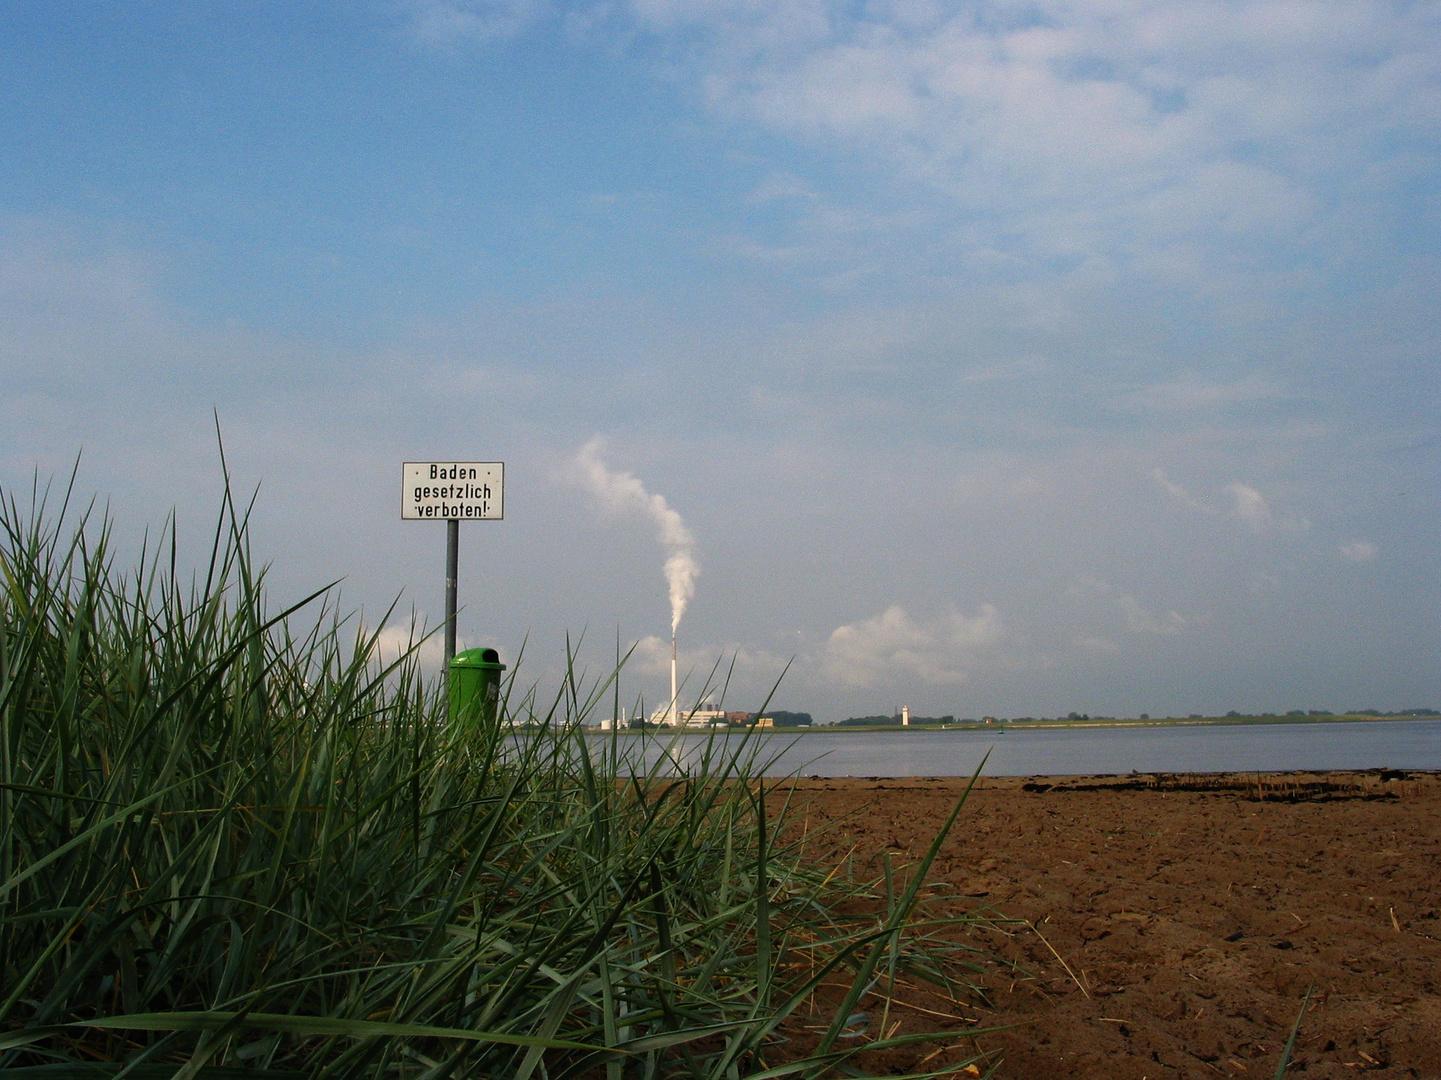 Am Strandbad in Bremerhaven 2